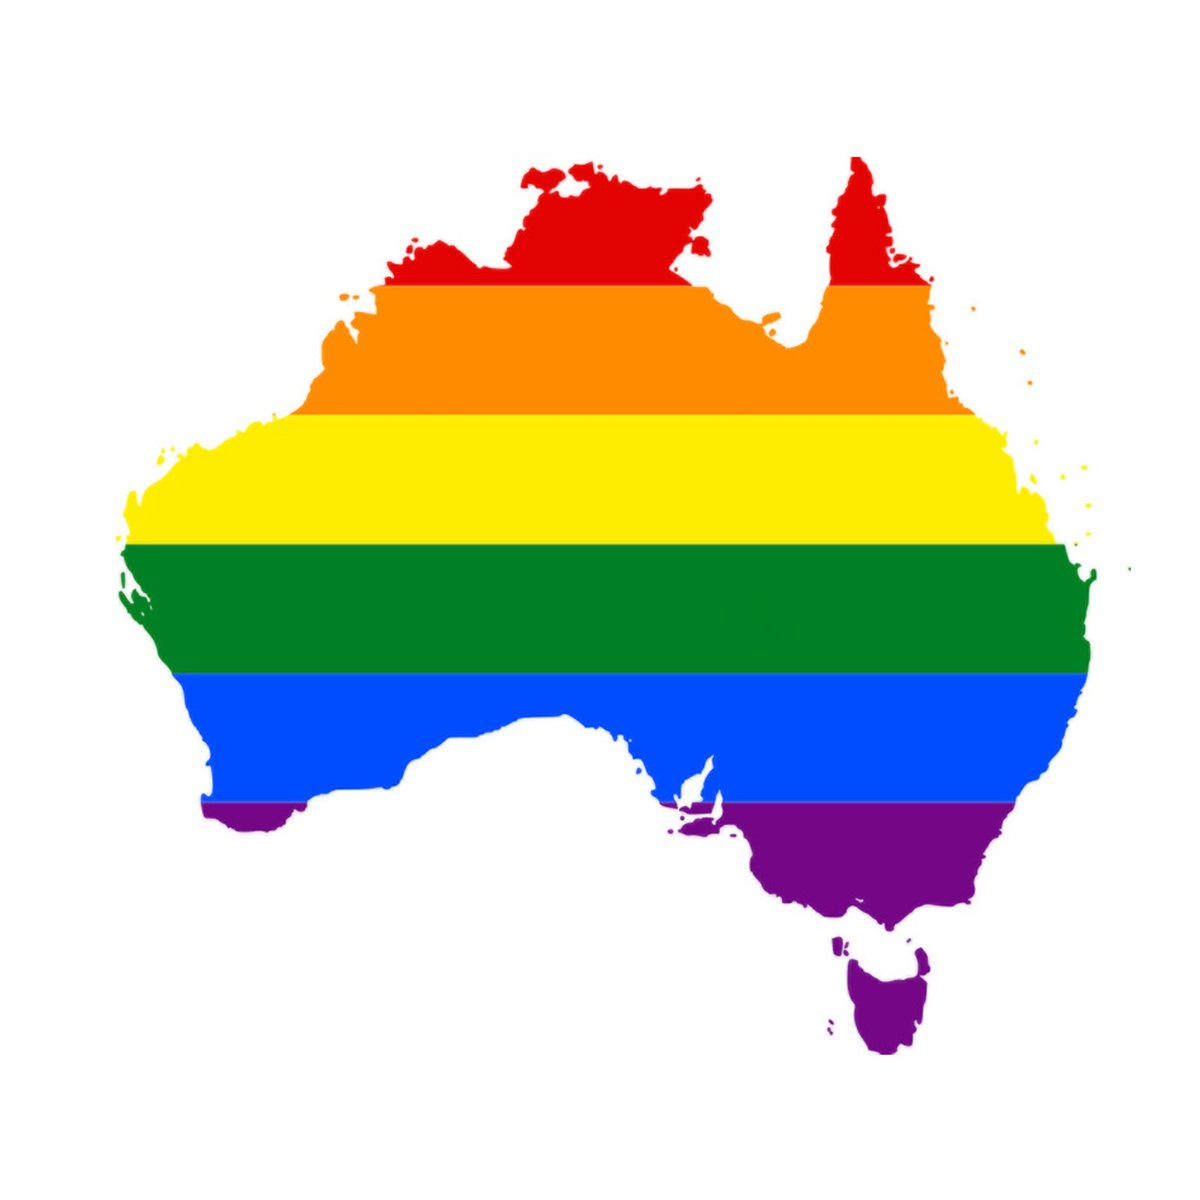 BREAKING: It's official! Australia parli...